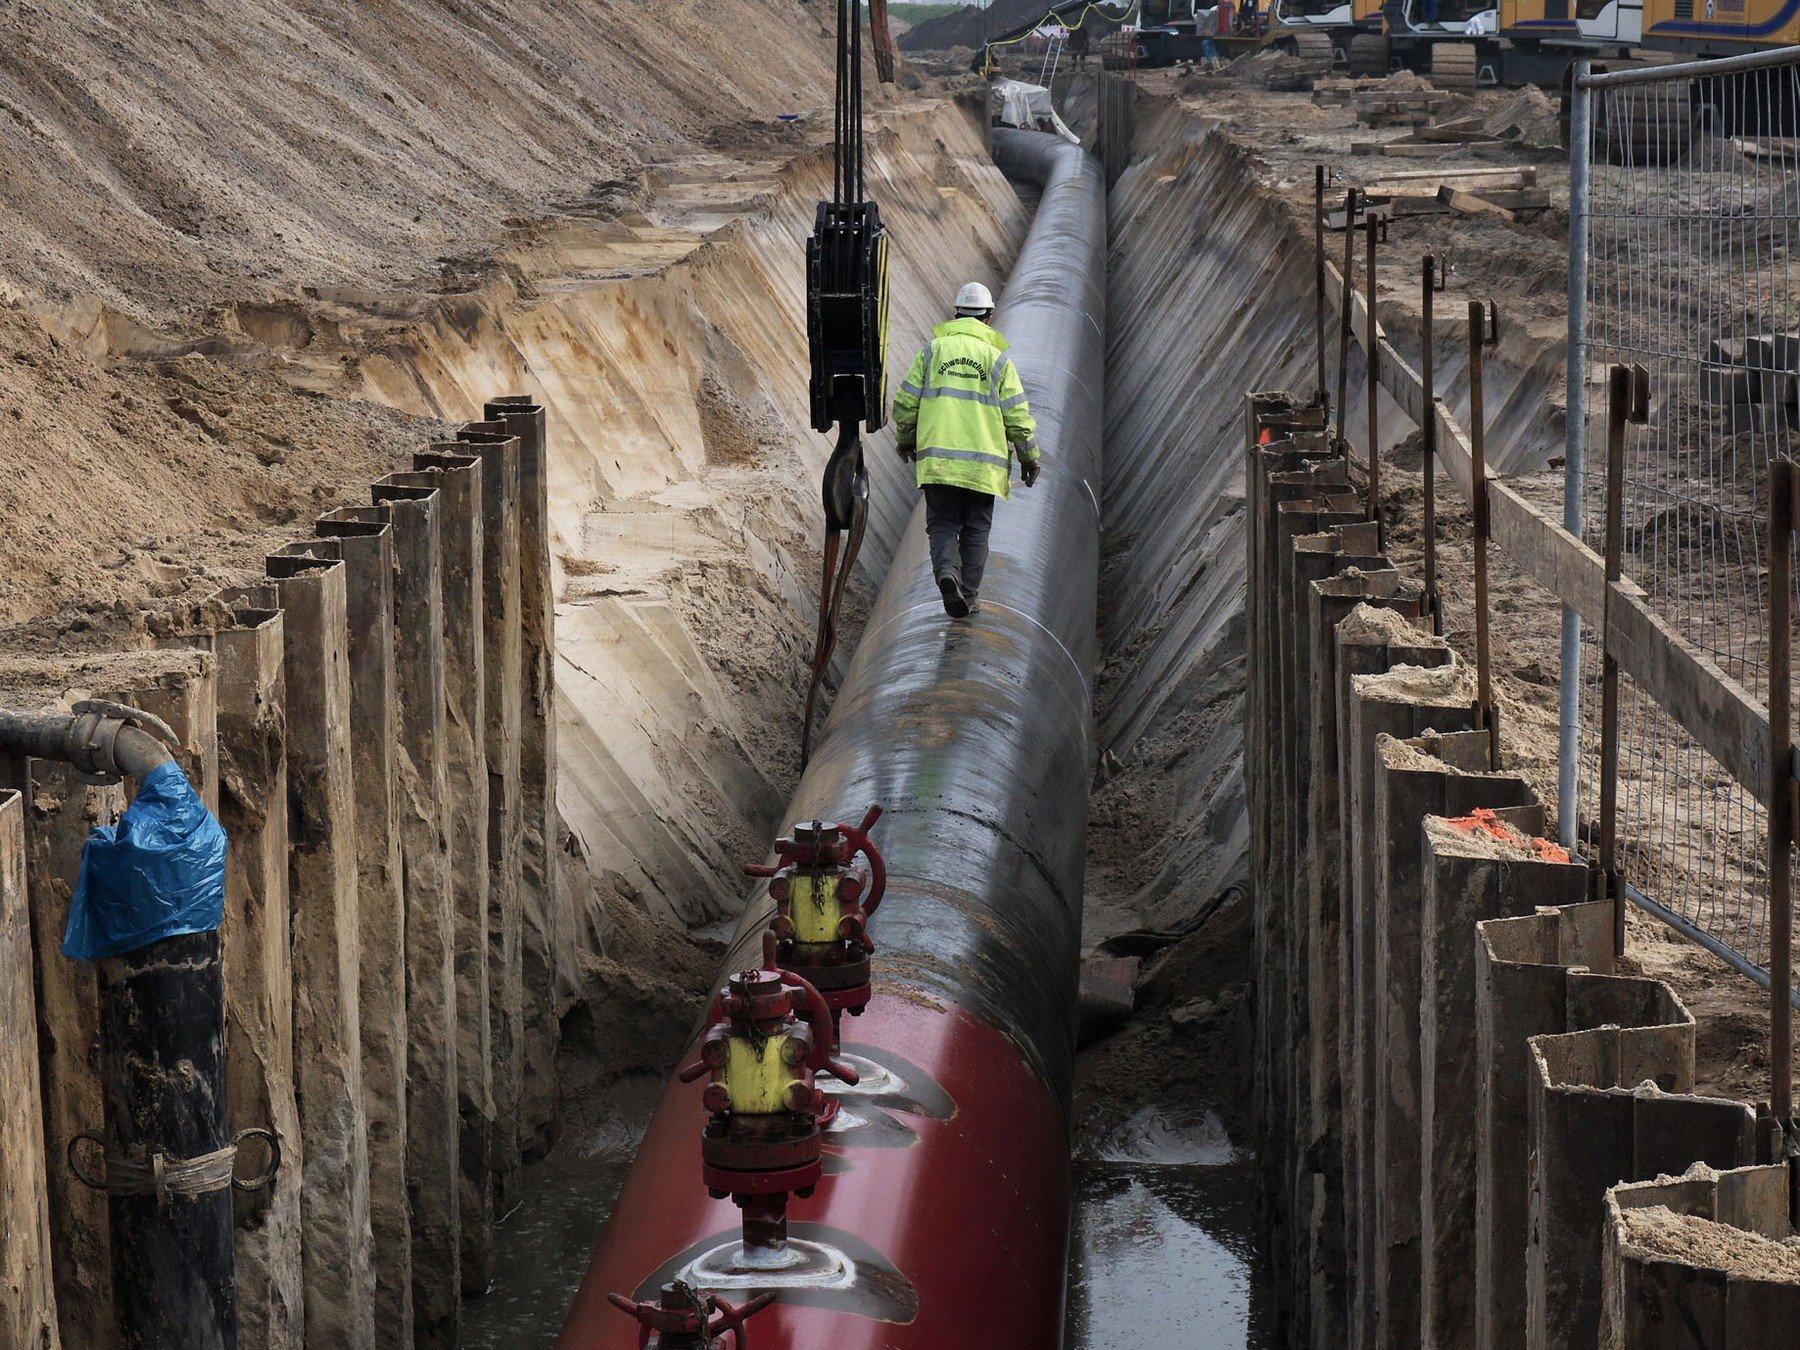 Gradnja plinovoda Sjeverni tok